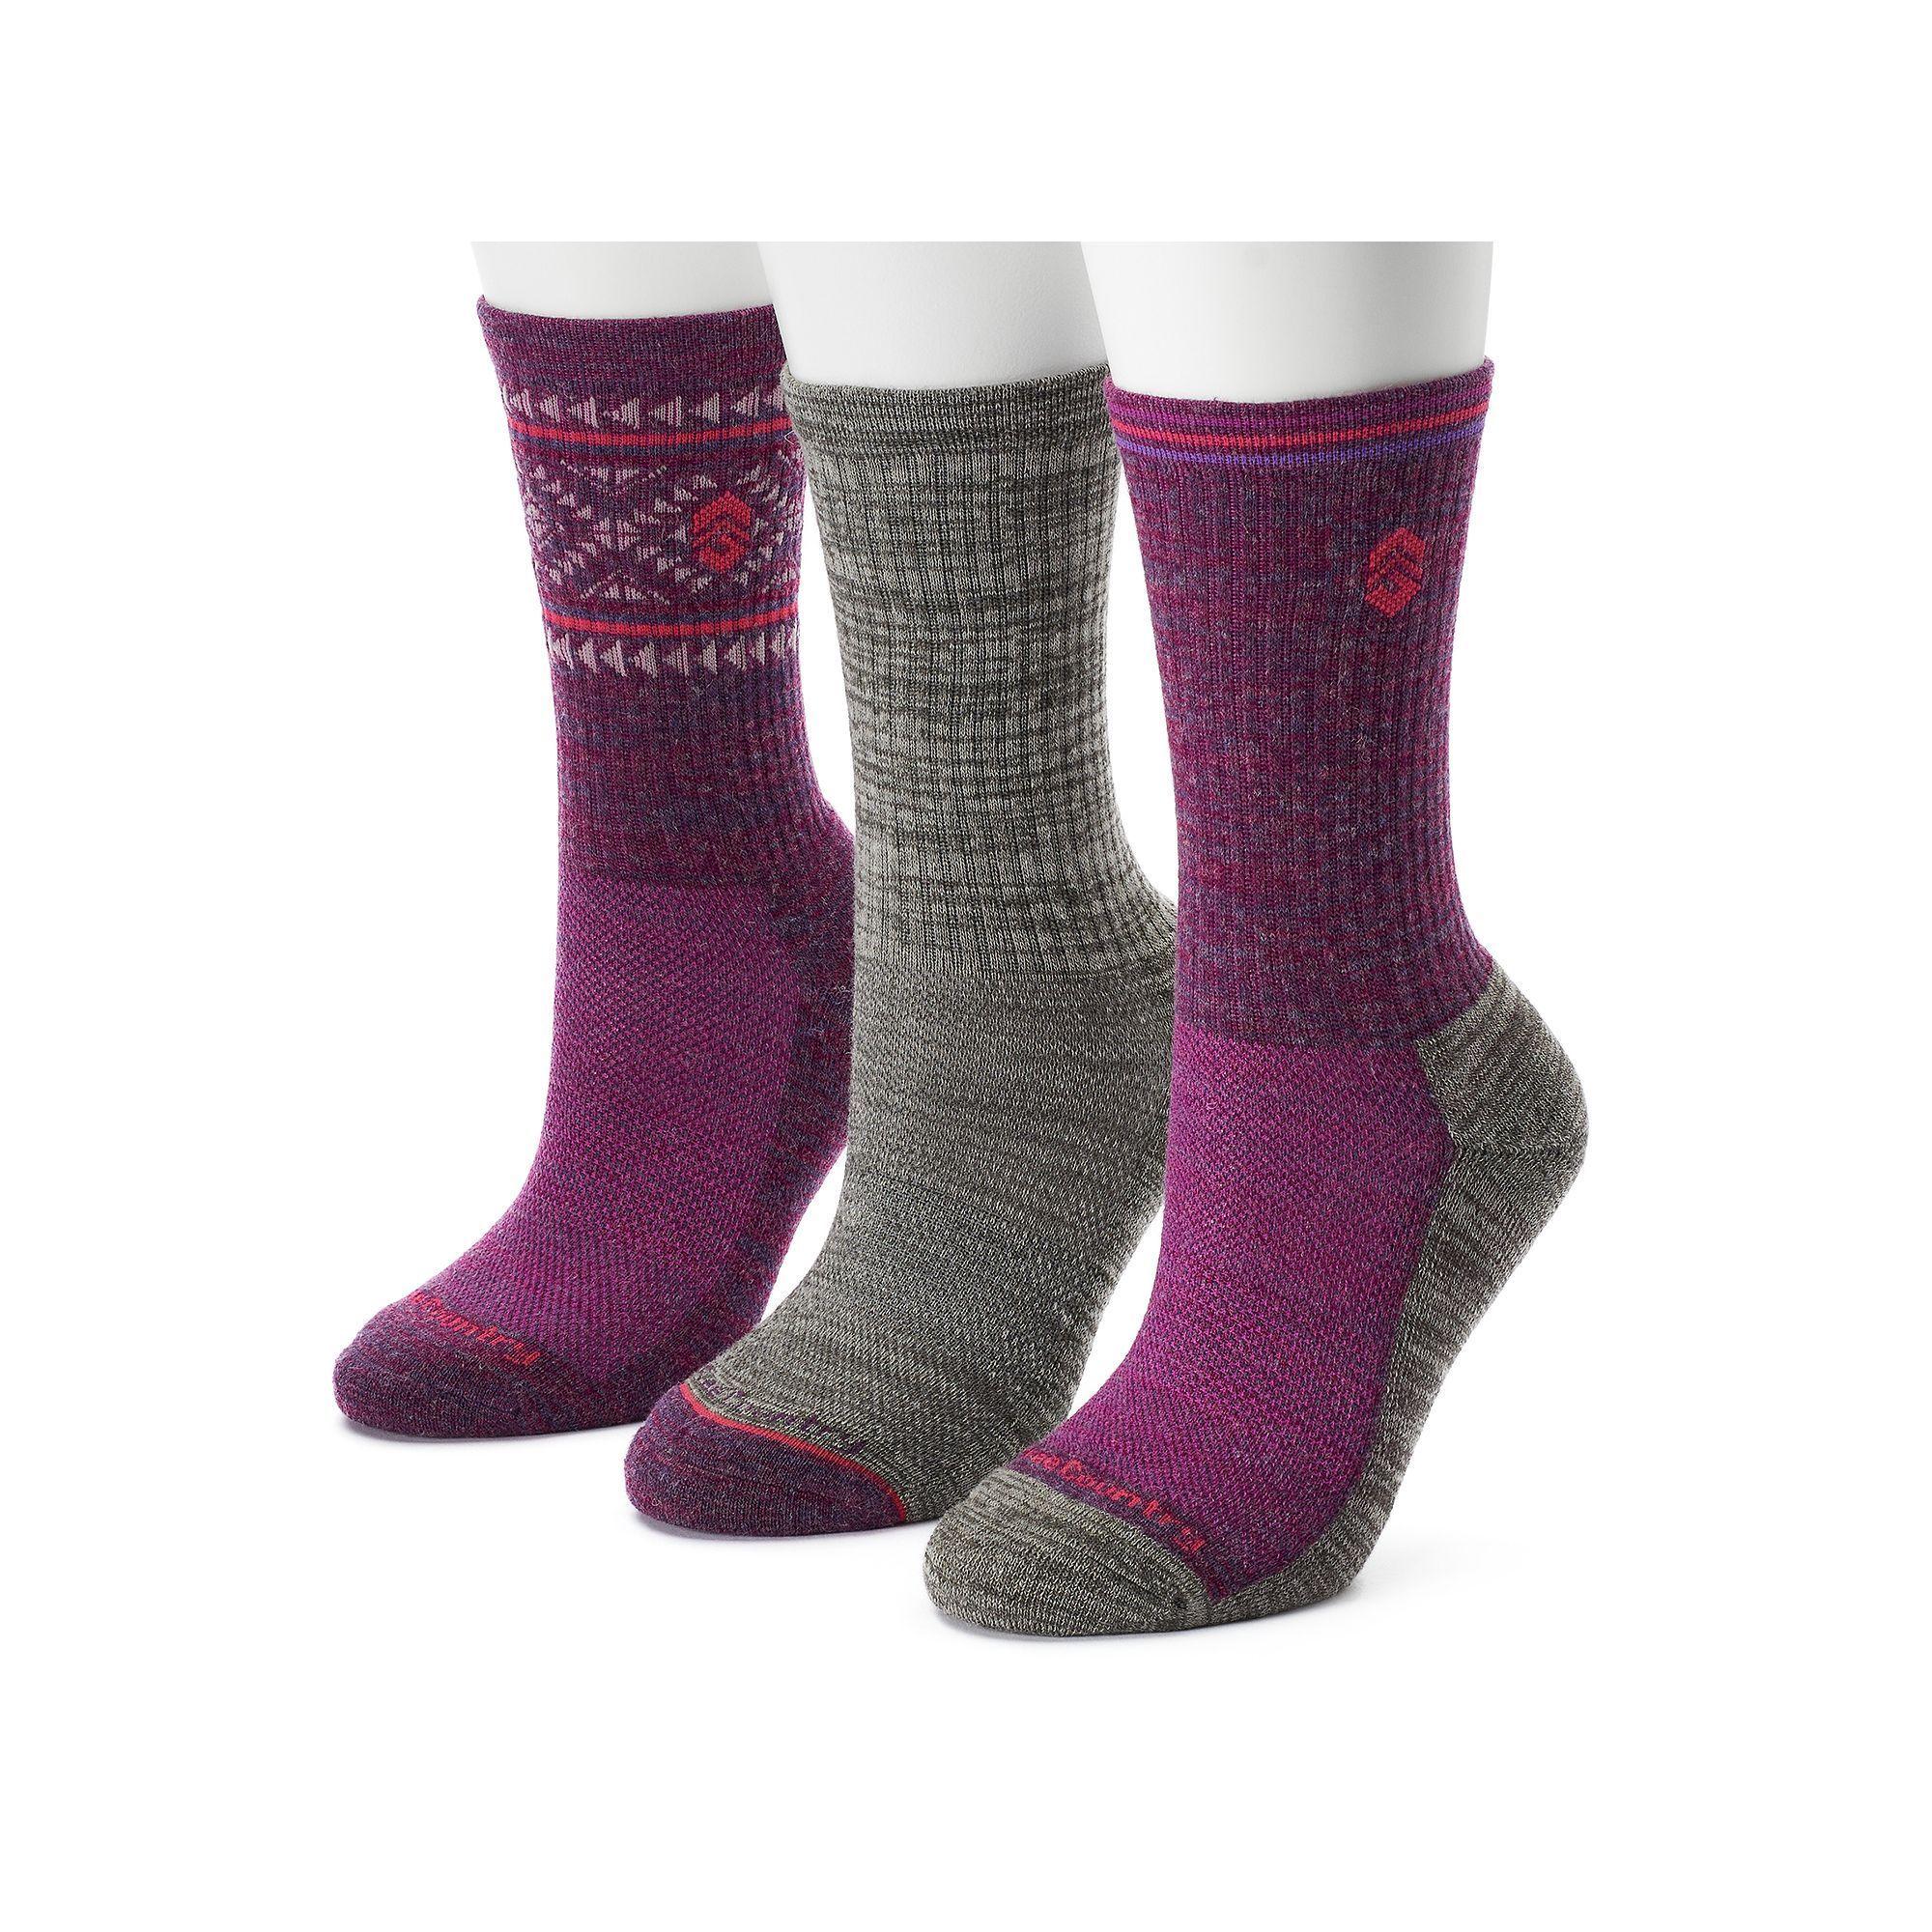 Women's Free Country 3-pk. Tribal Marled Wool-Blend Hiking Socks, Size: 9-11, Purple